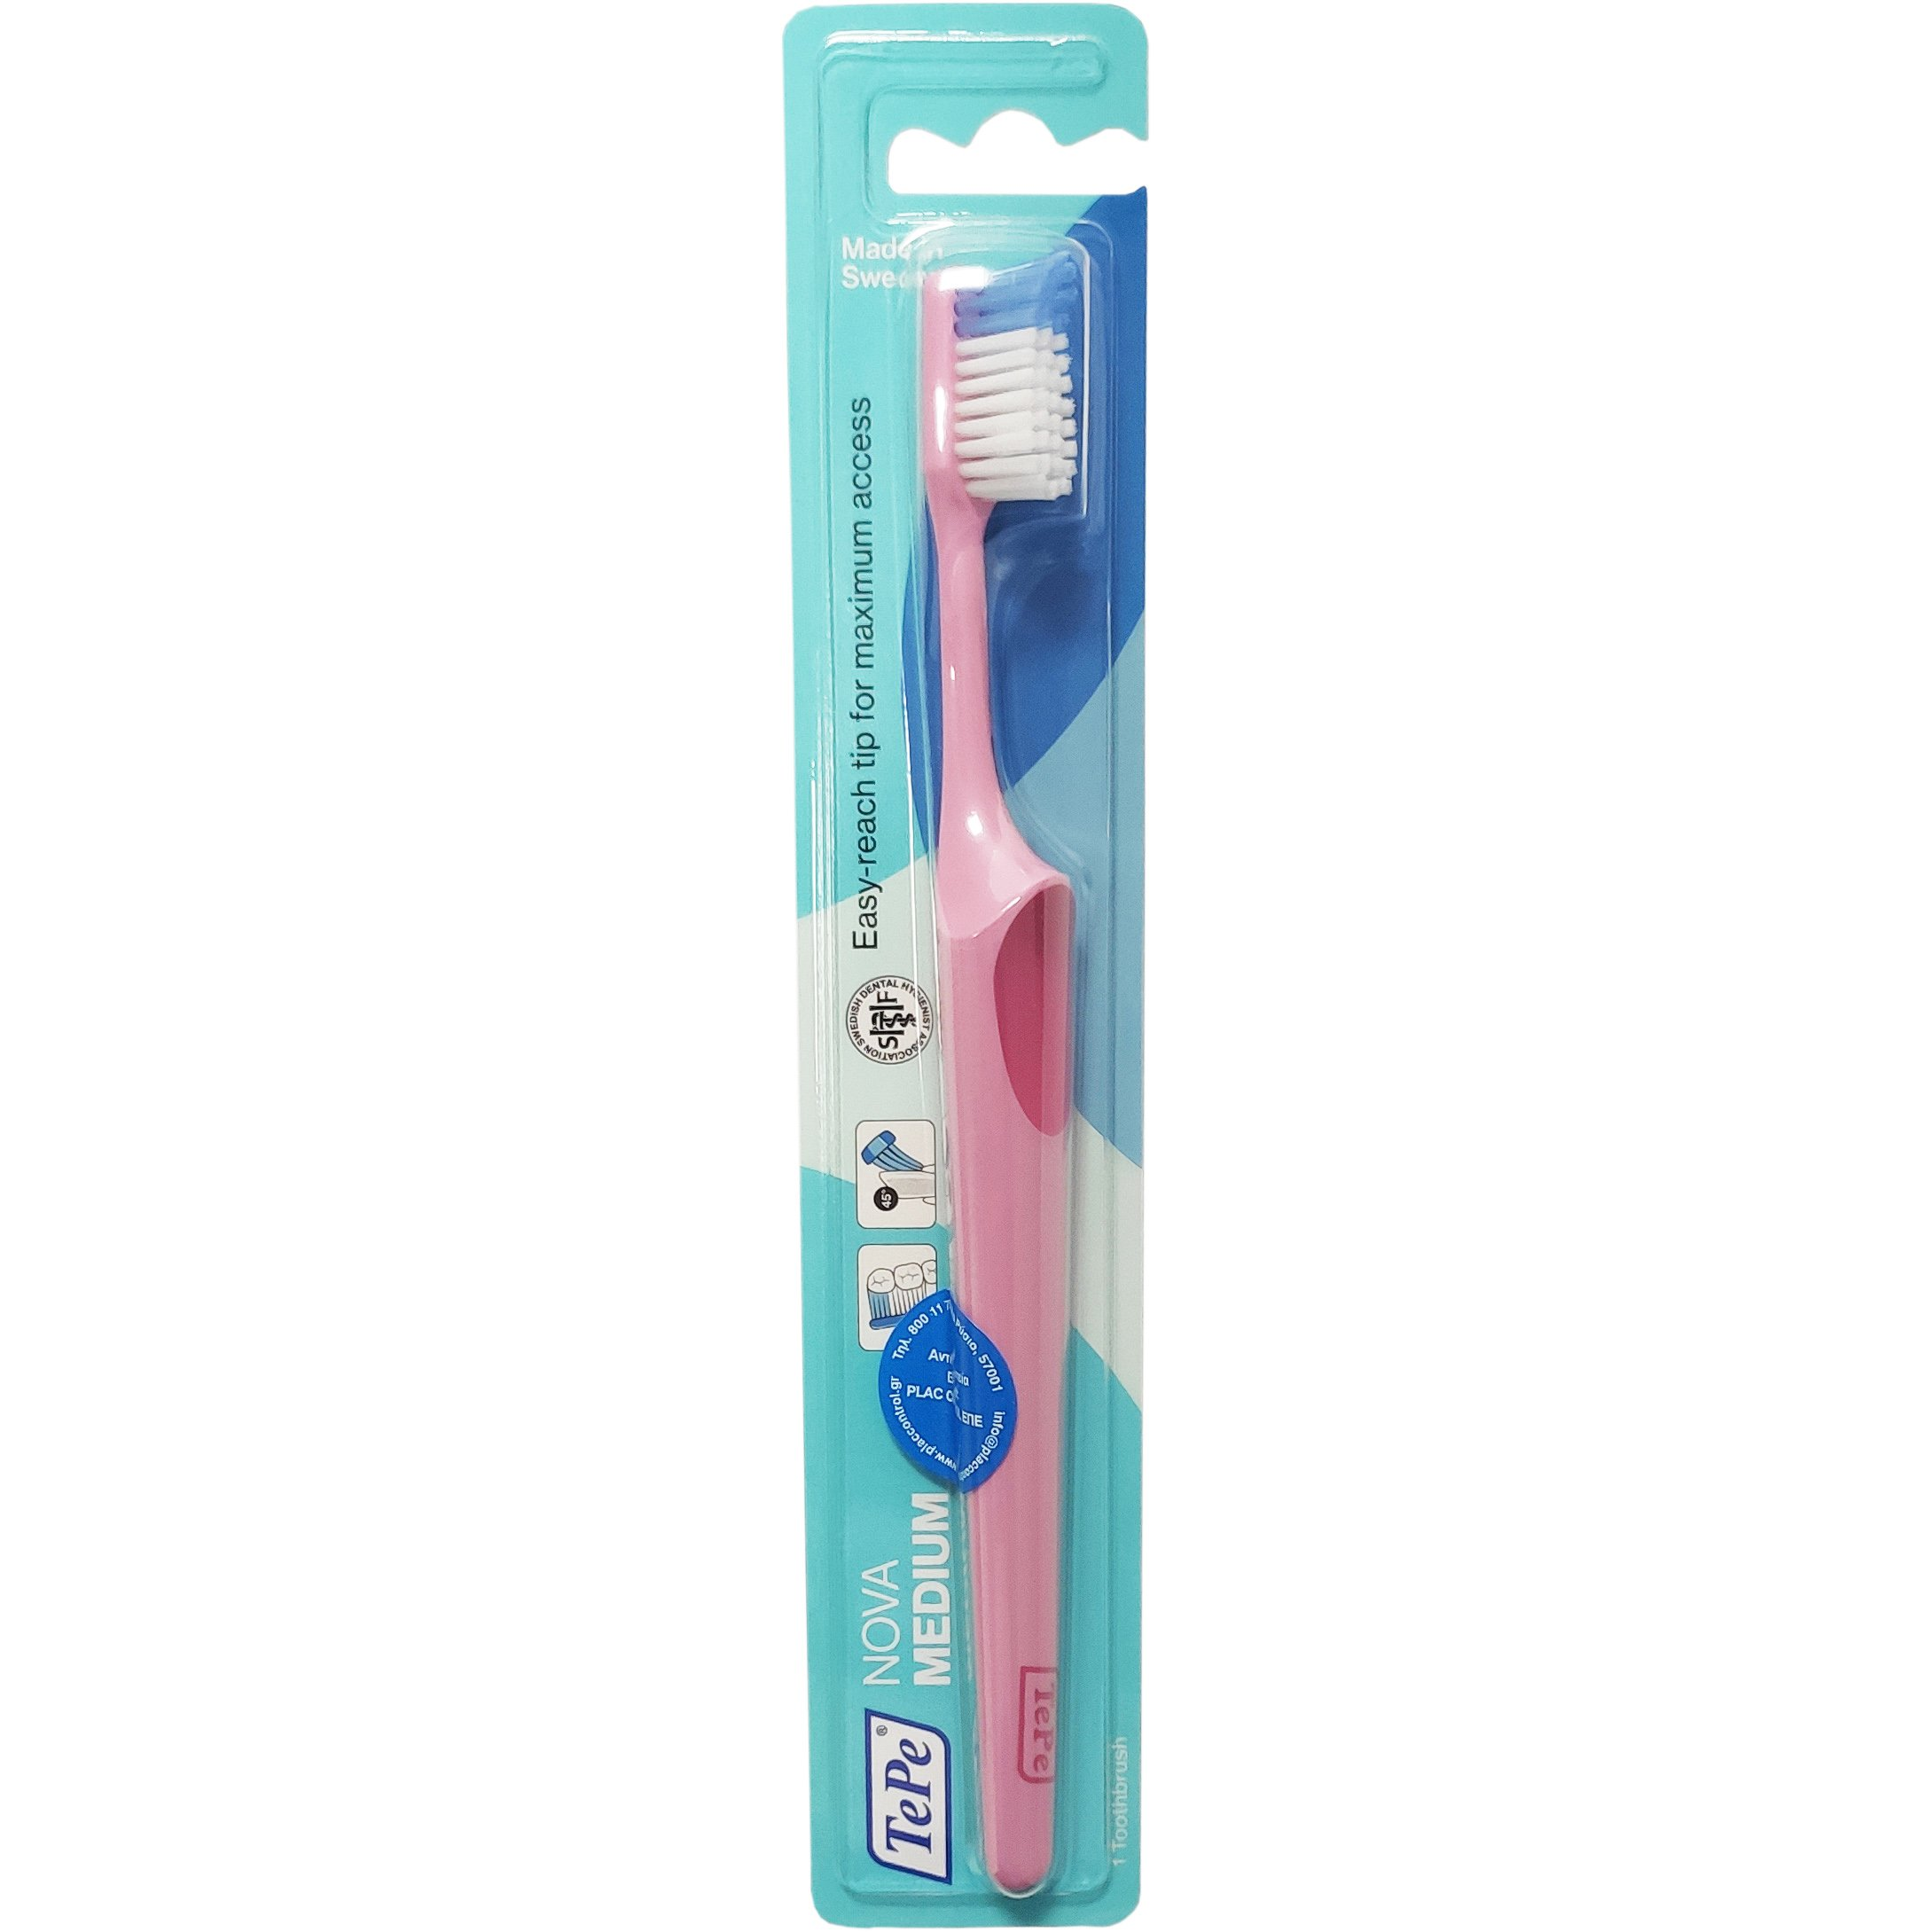 TePe Nova Medium Οδοντόβουρτσα Μέτρια με Ειδικά Σχεδιασμένη Κεφαλή για Καλή Πρόσβαση που δεν Τραυματίζει 1 Τεμάχιο – ροζ